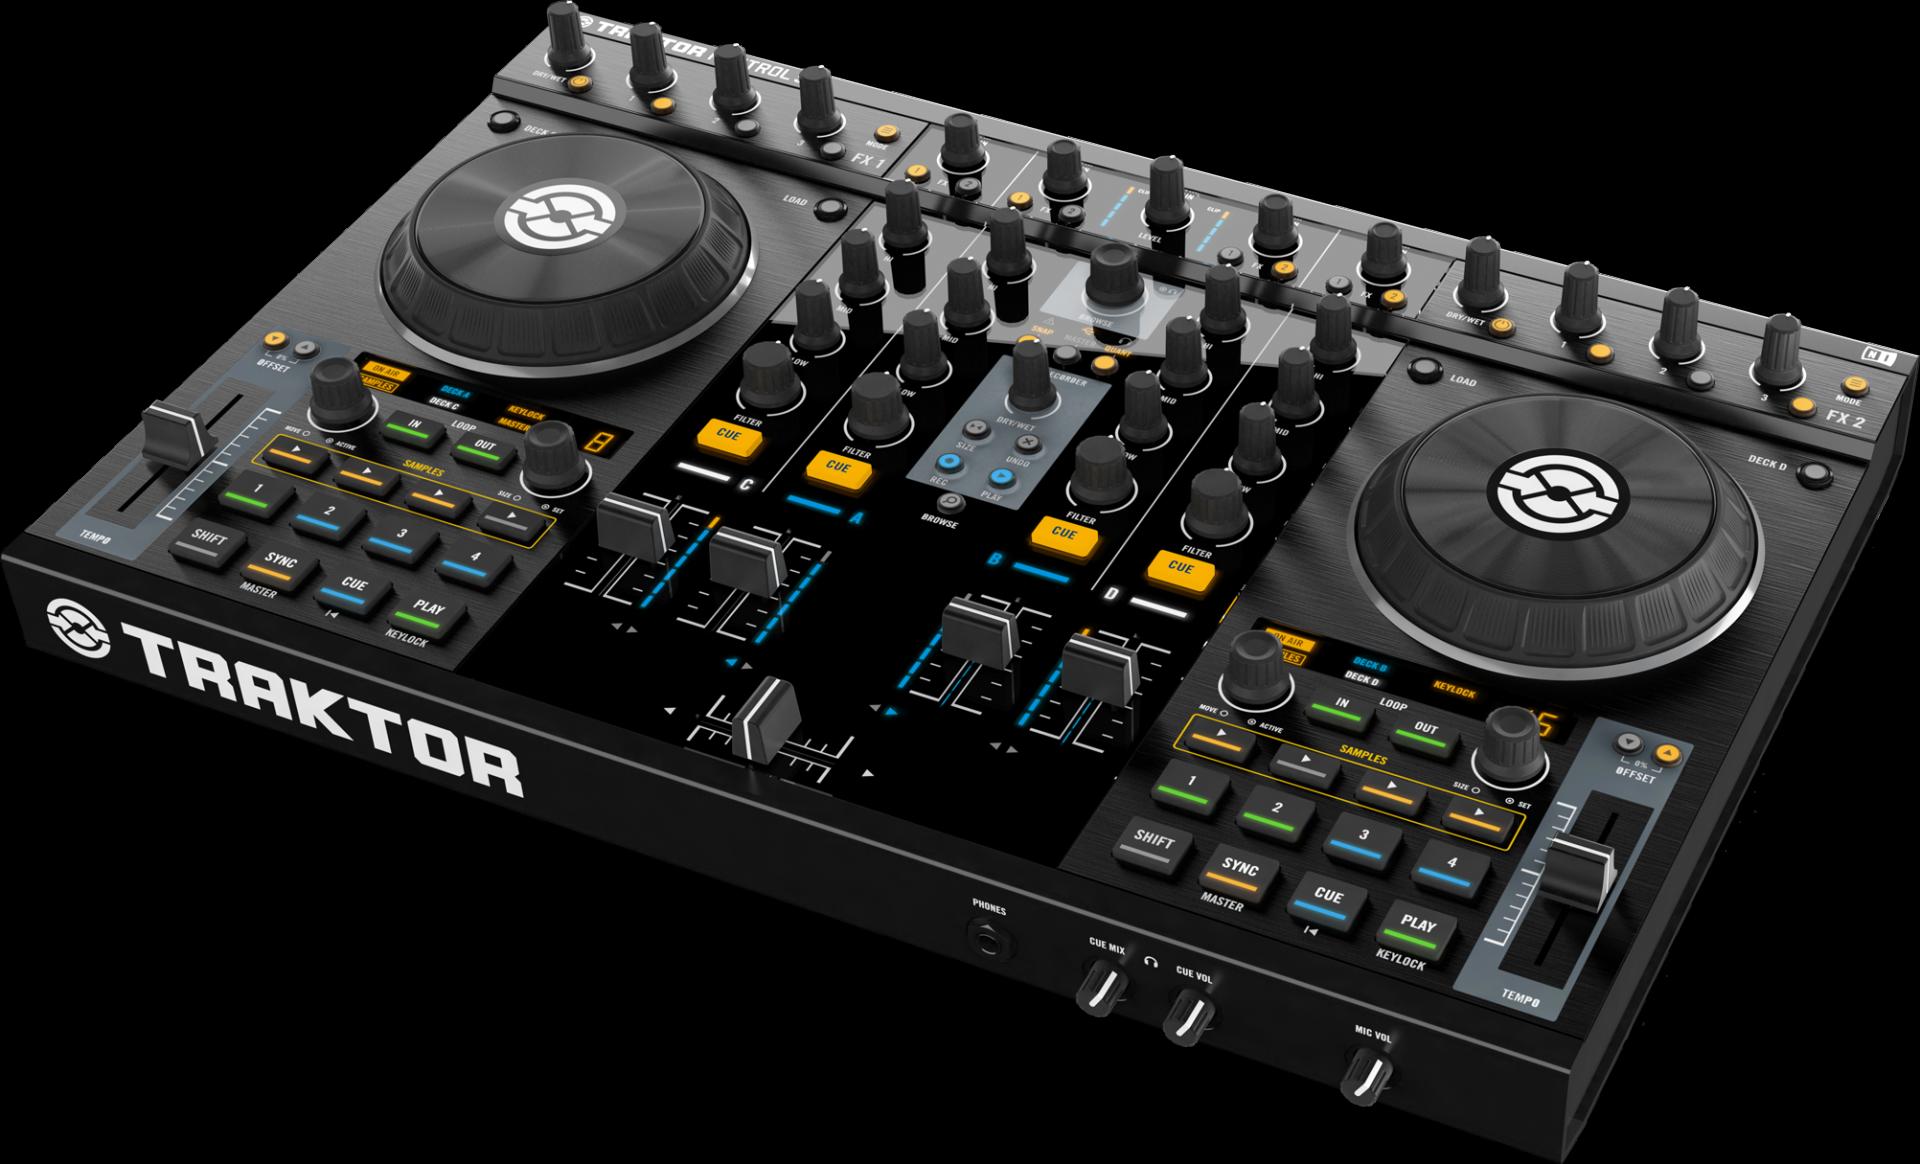 Traktor Kontrol S4 DJ controller.